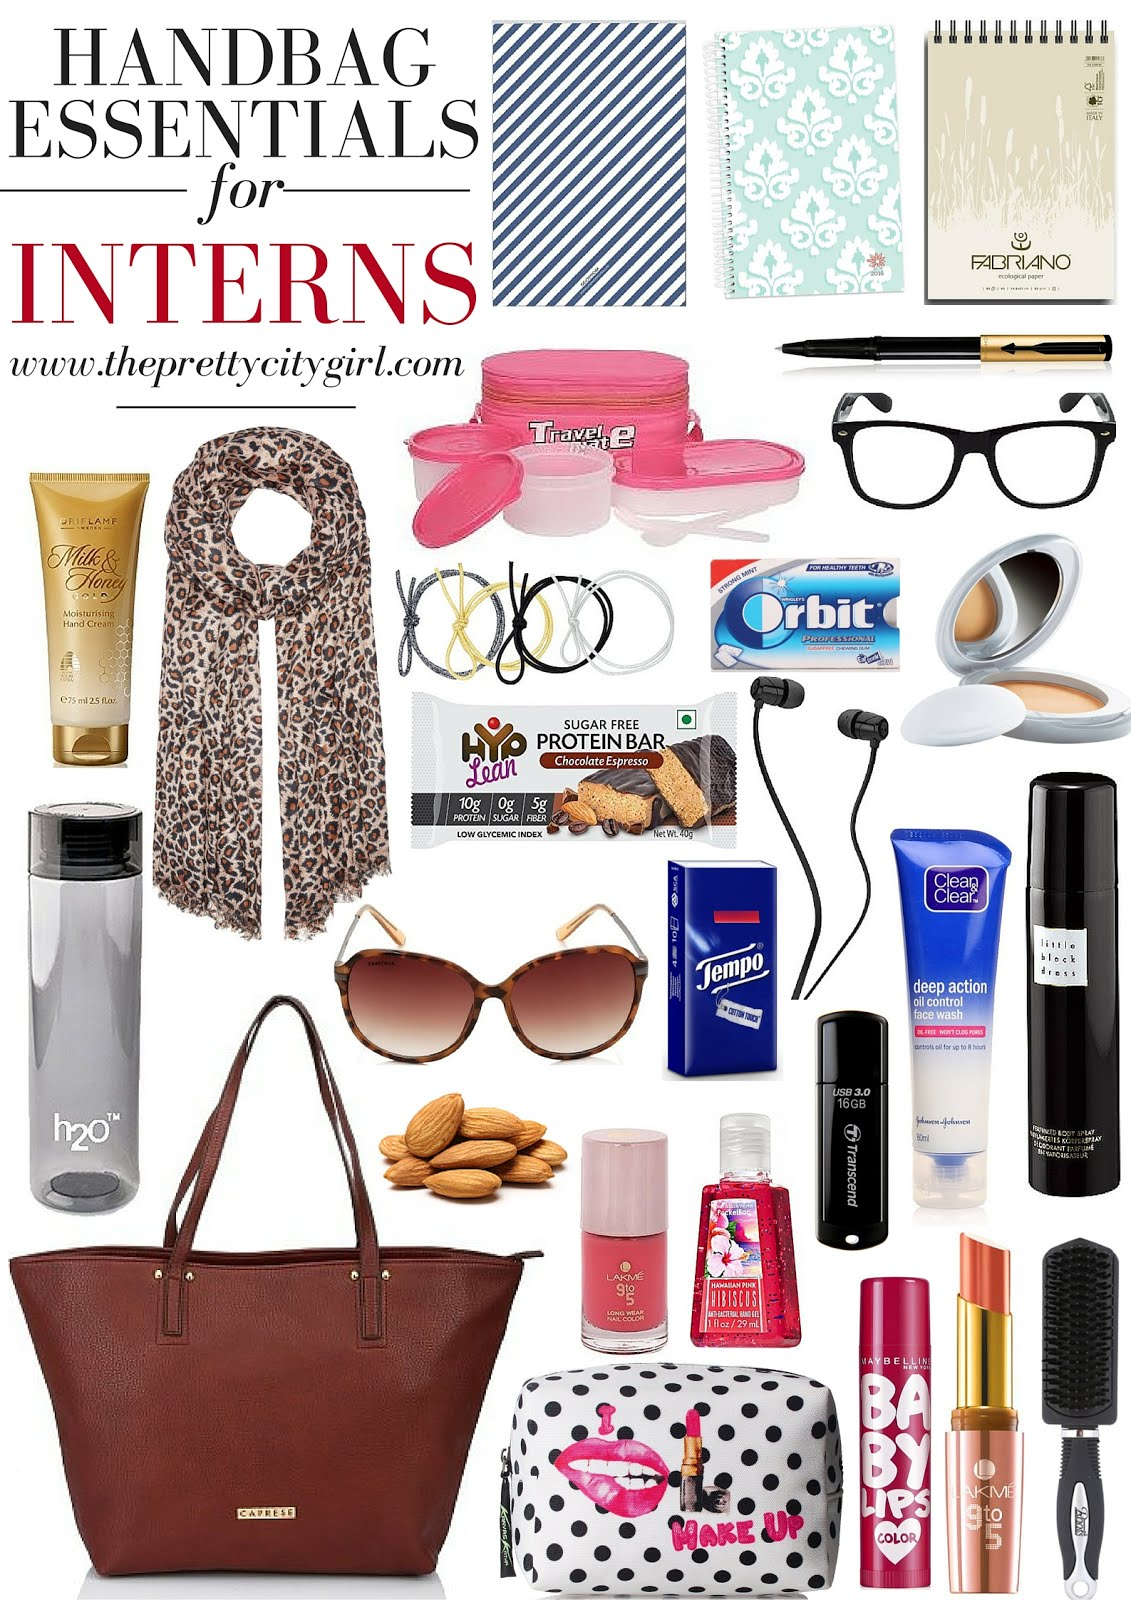 Handbag Essentials For Interns